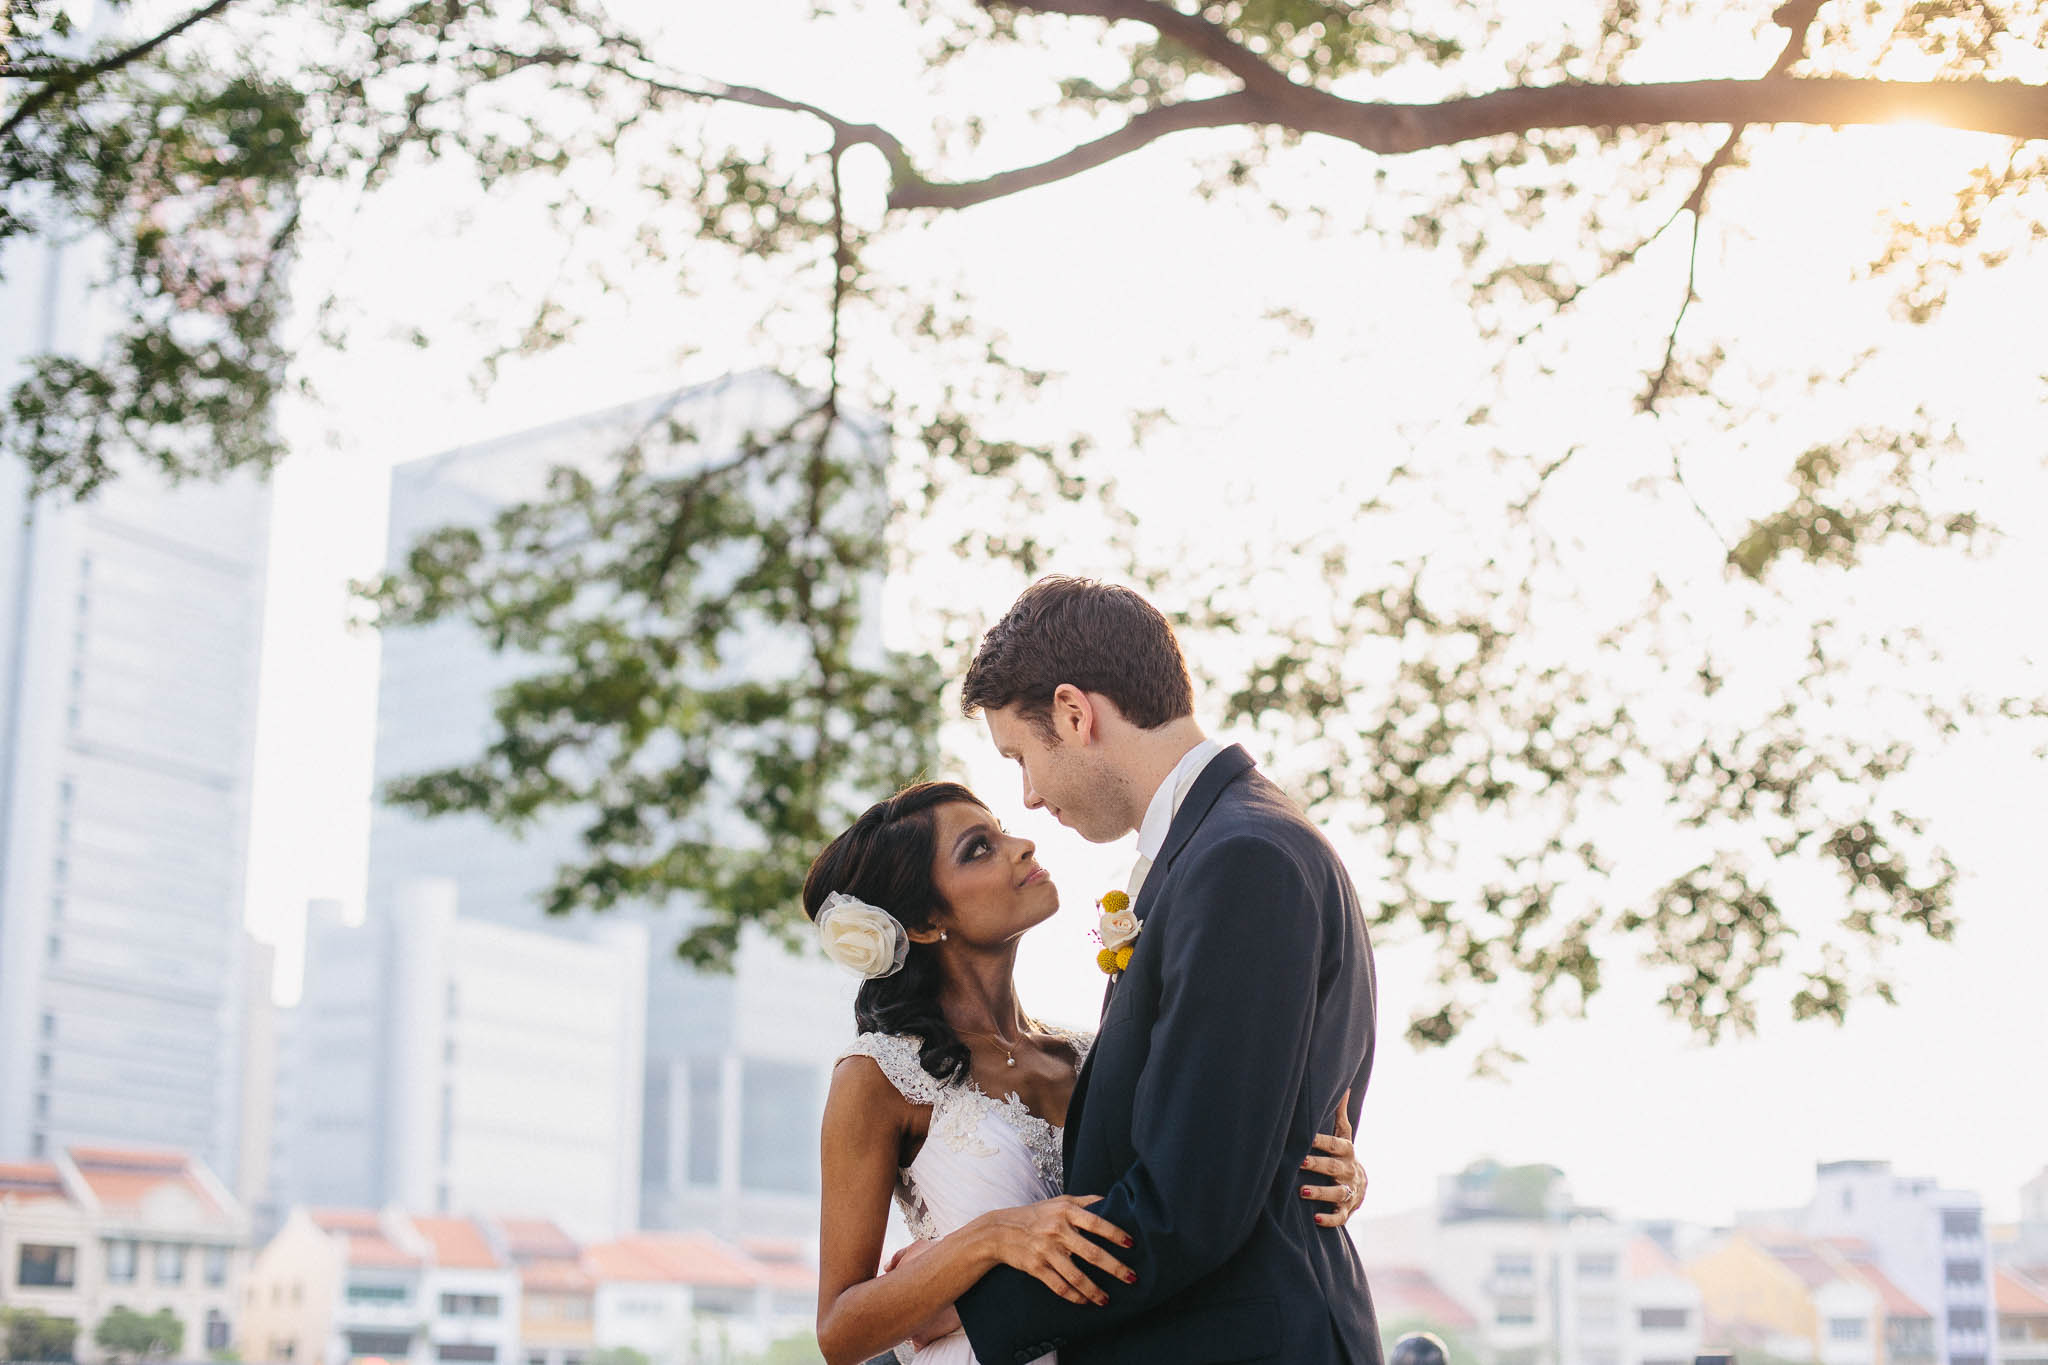 singapore-wedding-photographer-st-andrews-cathedral-renita-david-47.jpg